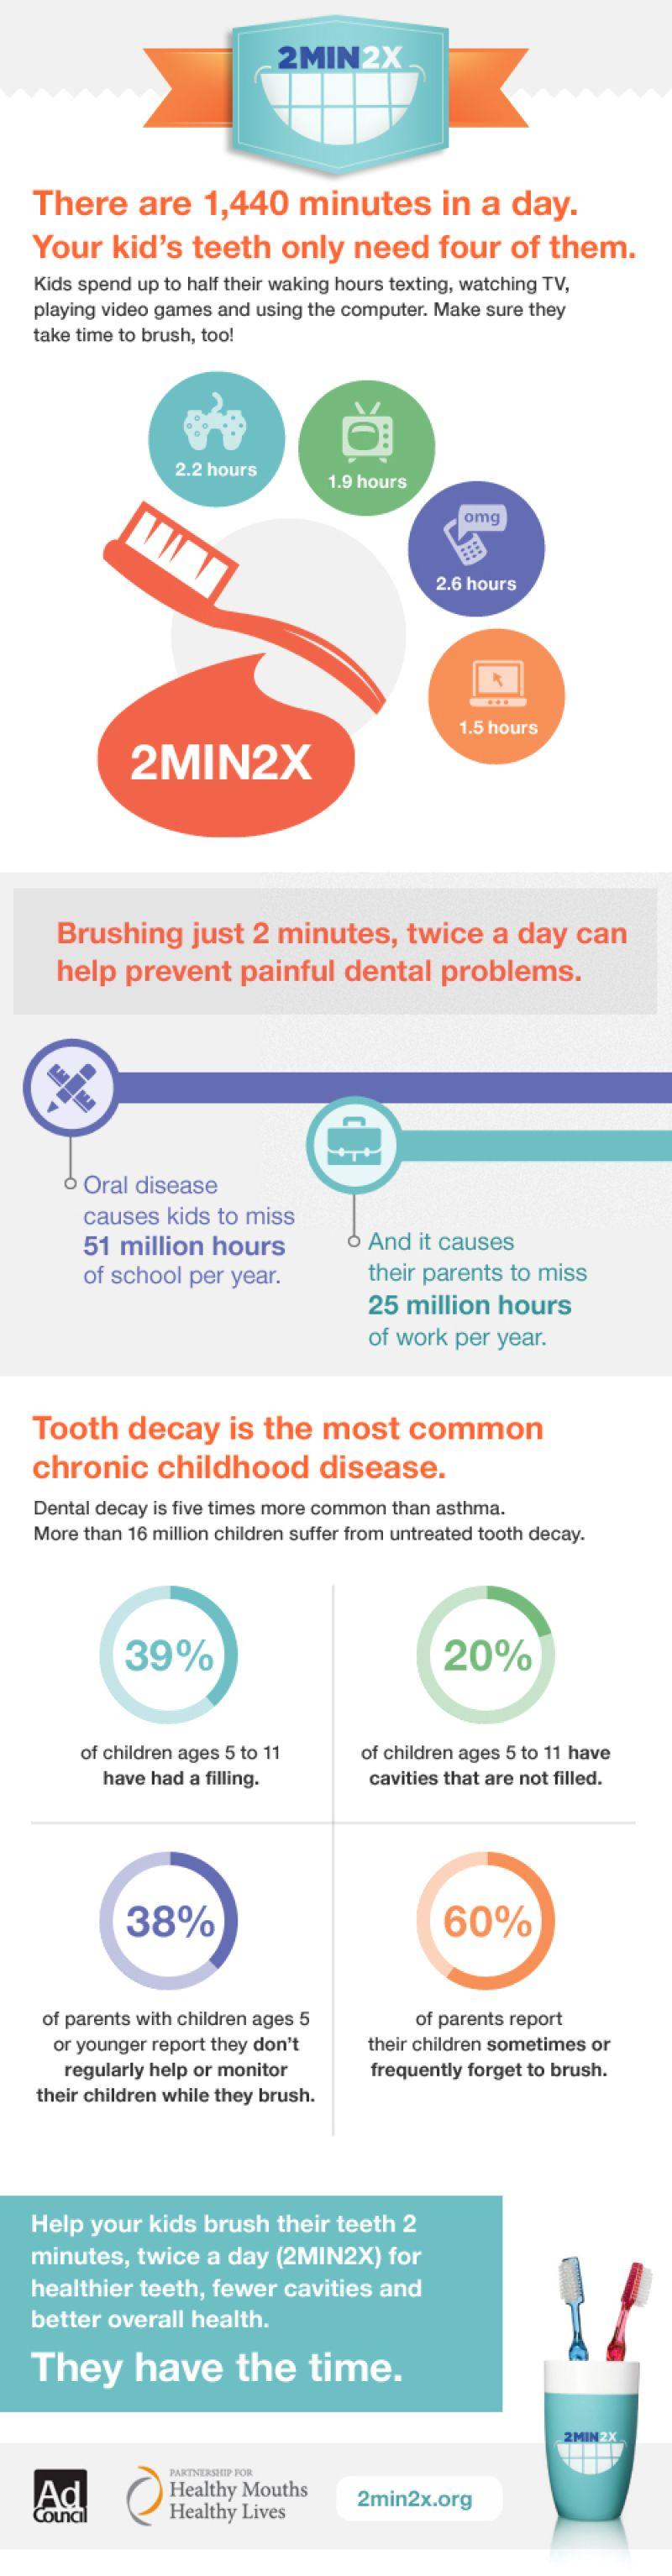 #dental #dentist #oralhealth #parenting #parentingtips #parentingadvice #lpa #lpatucson #lapalomaacademy #lapaloma   La Paloma Academy, AZ